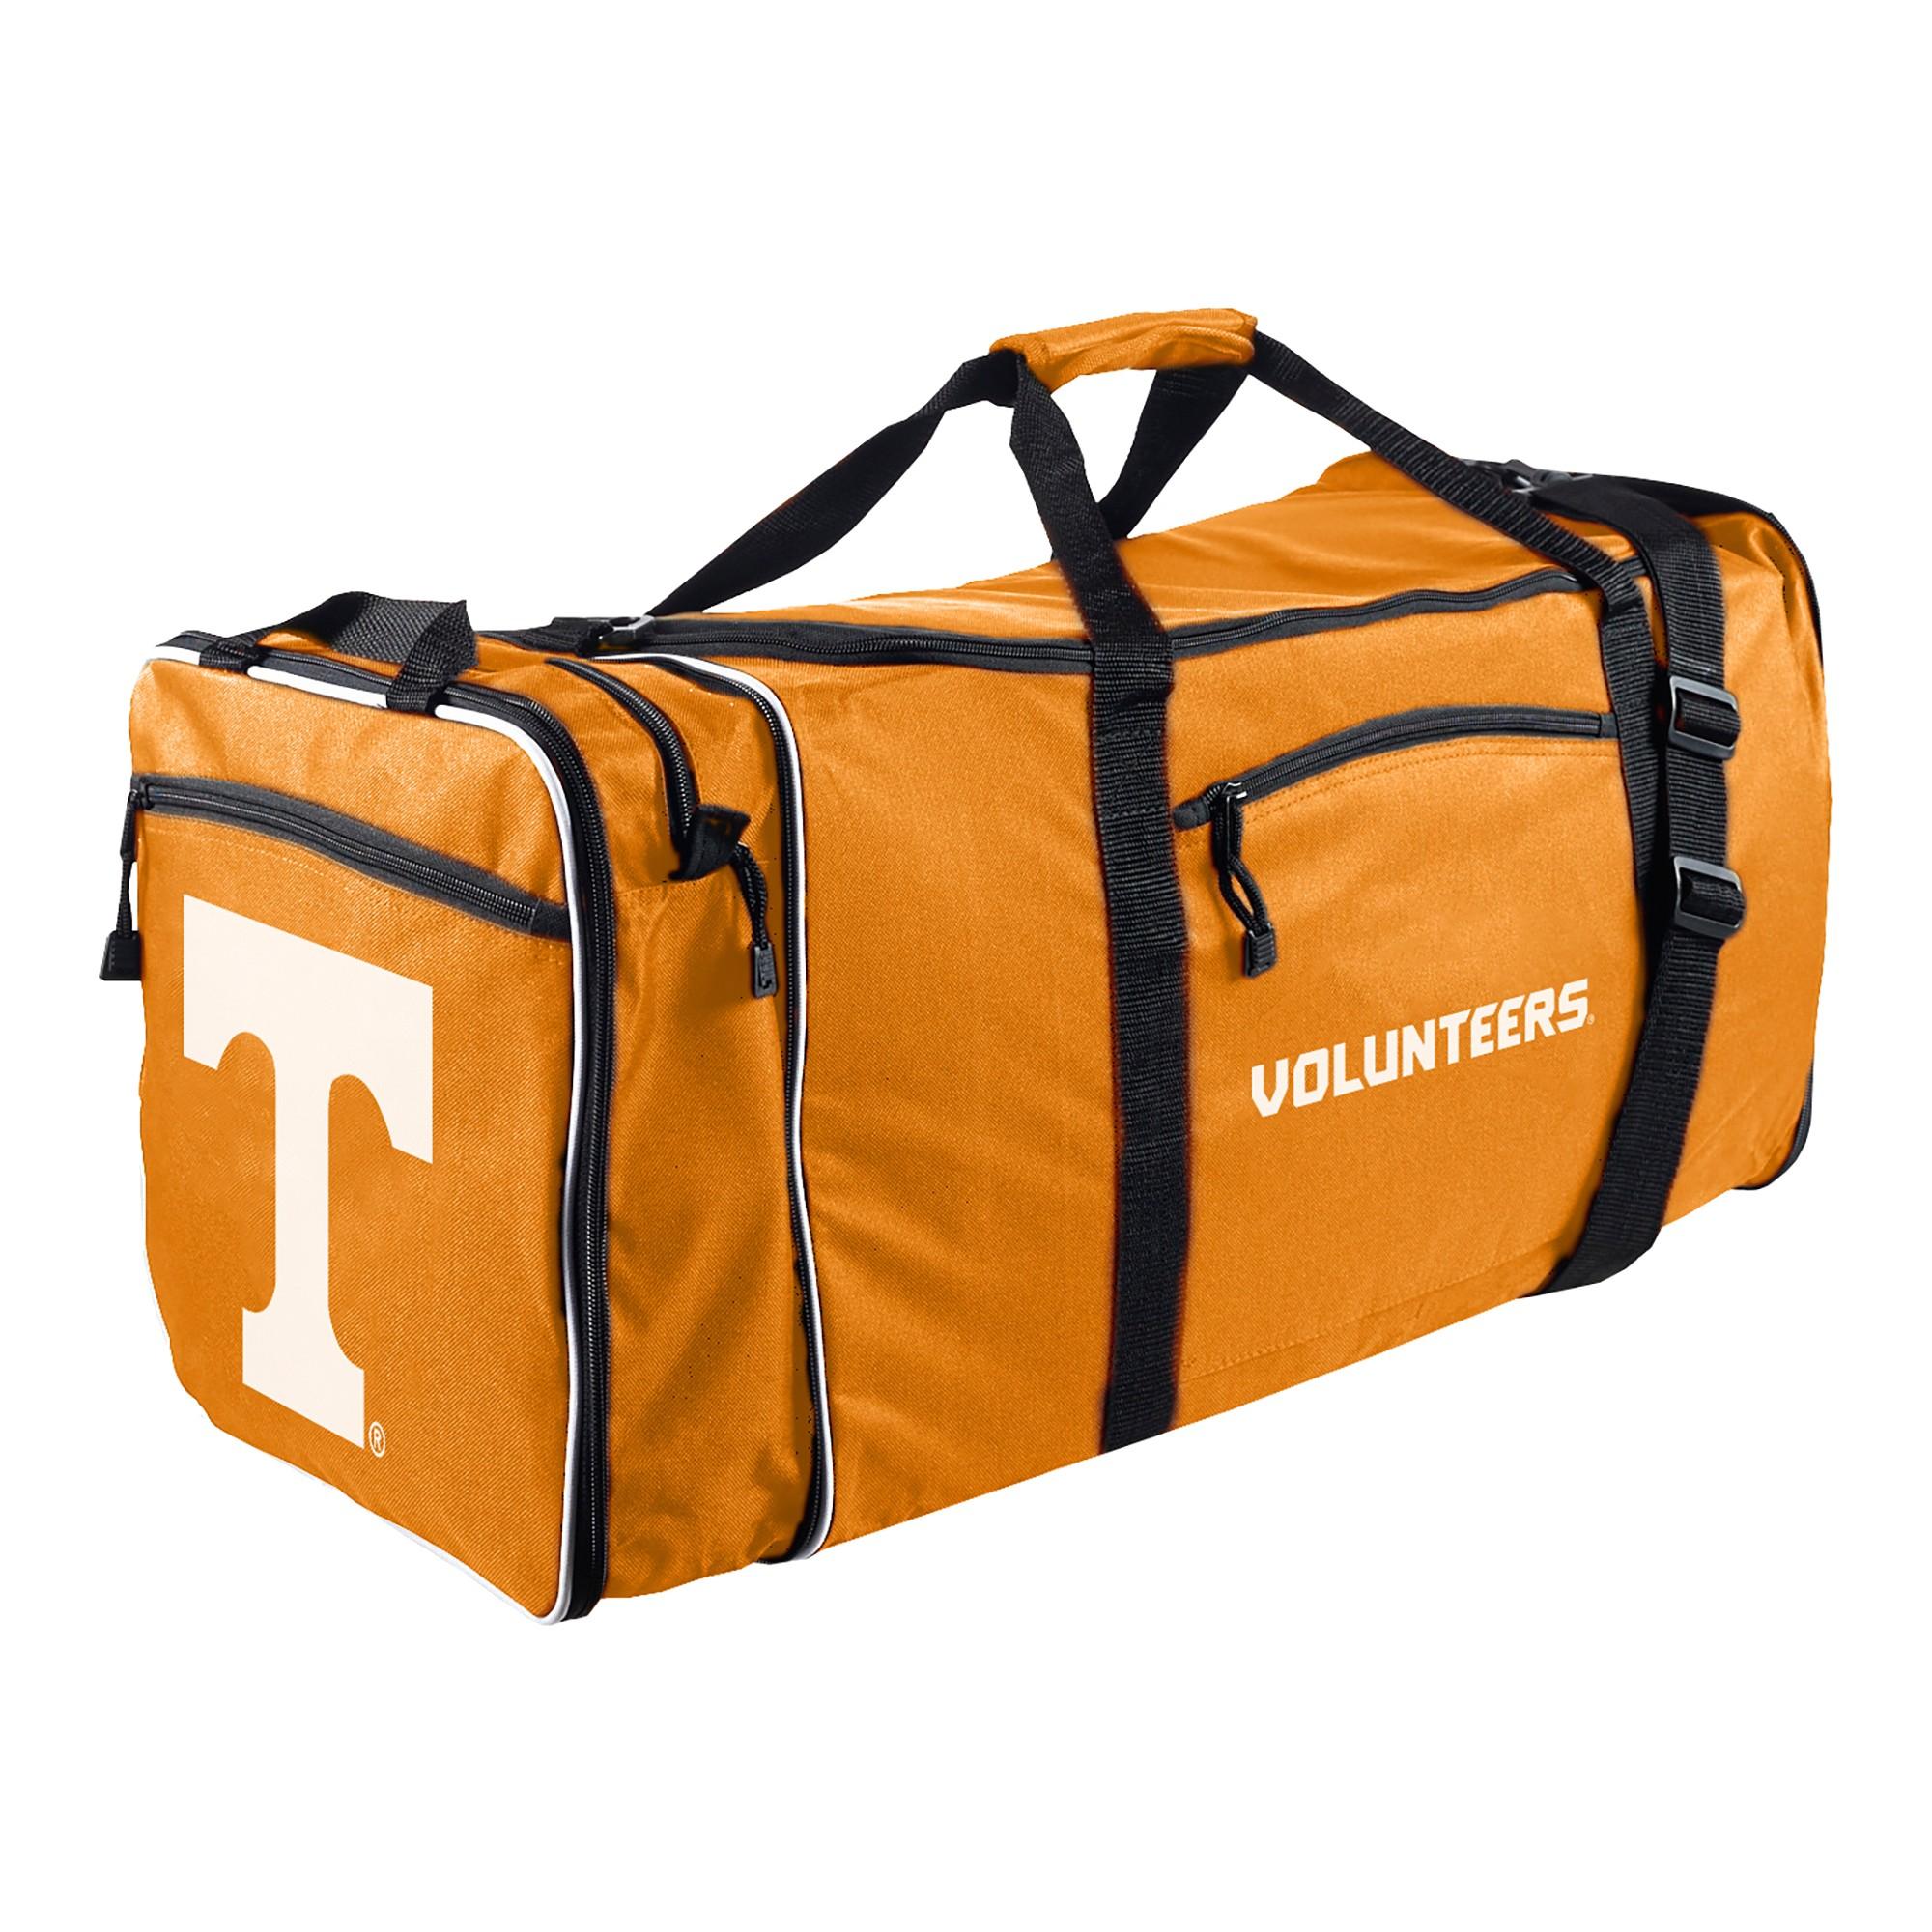 Ncaa northwest steal daypack duffel bag tennessee